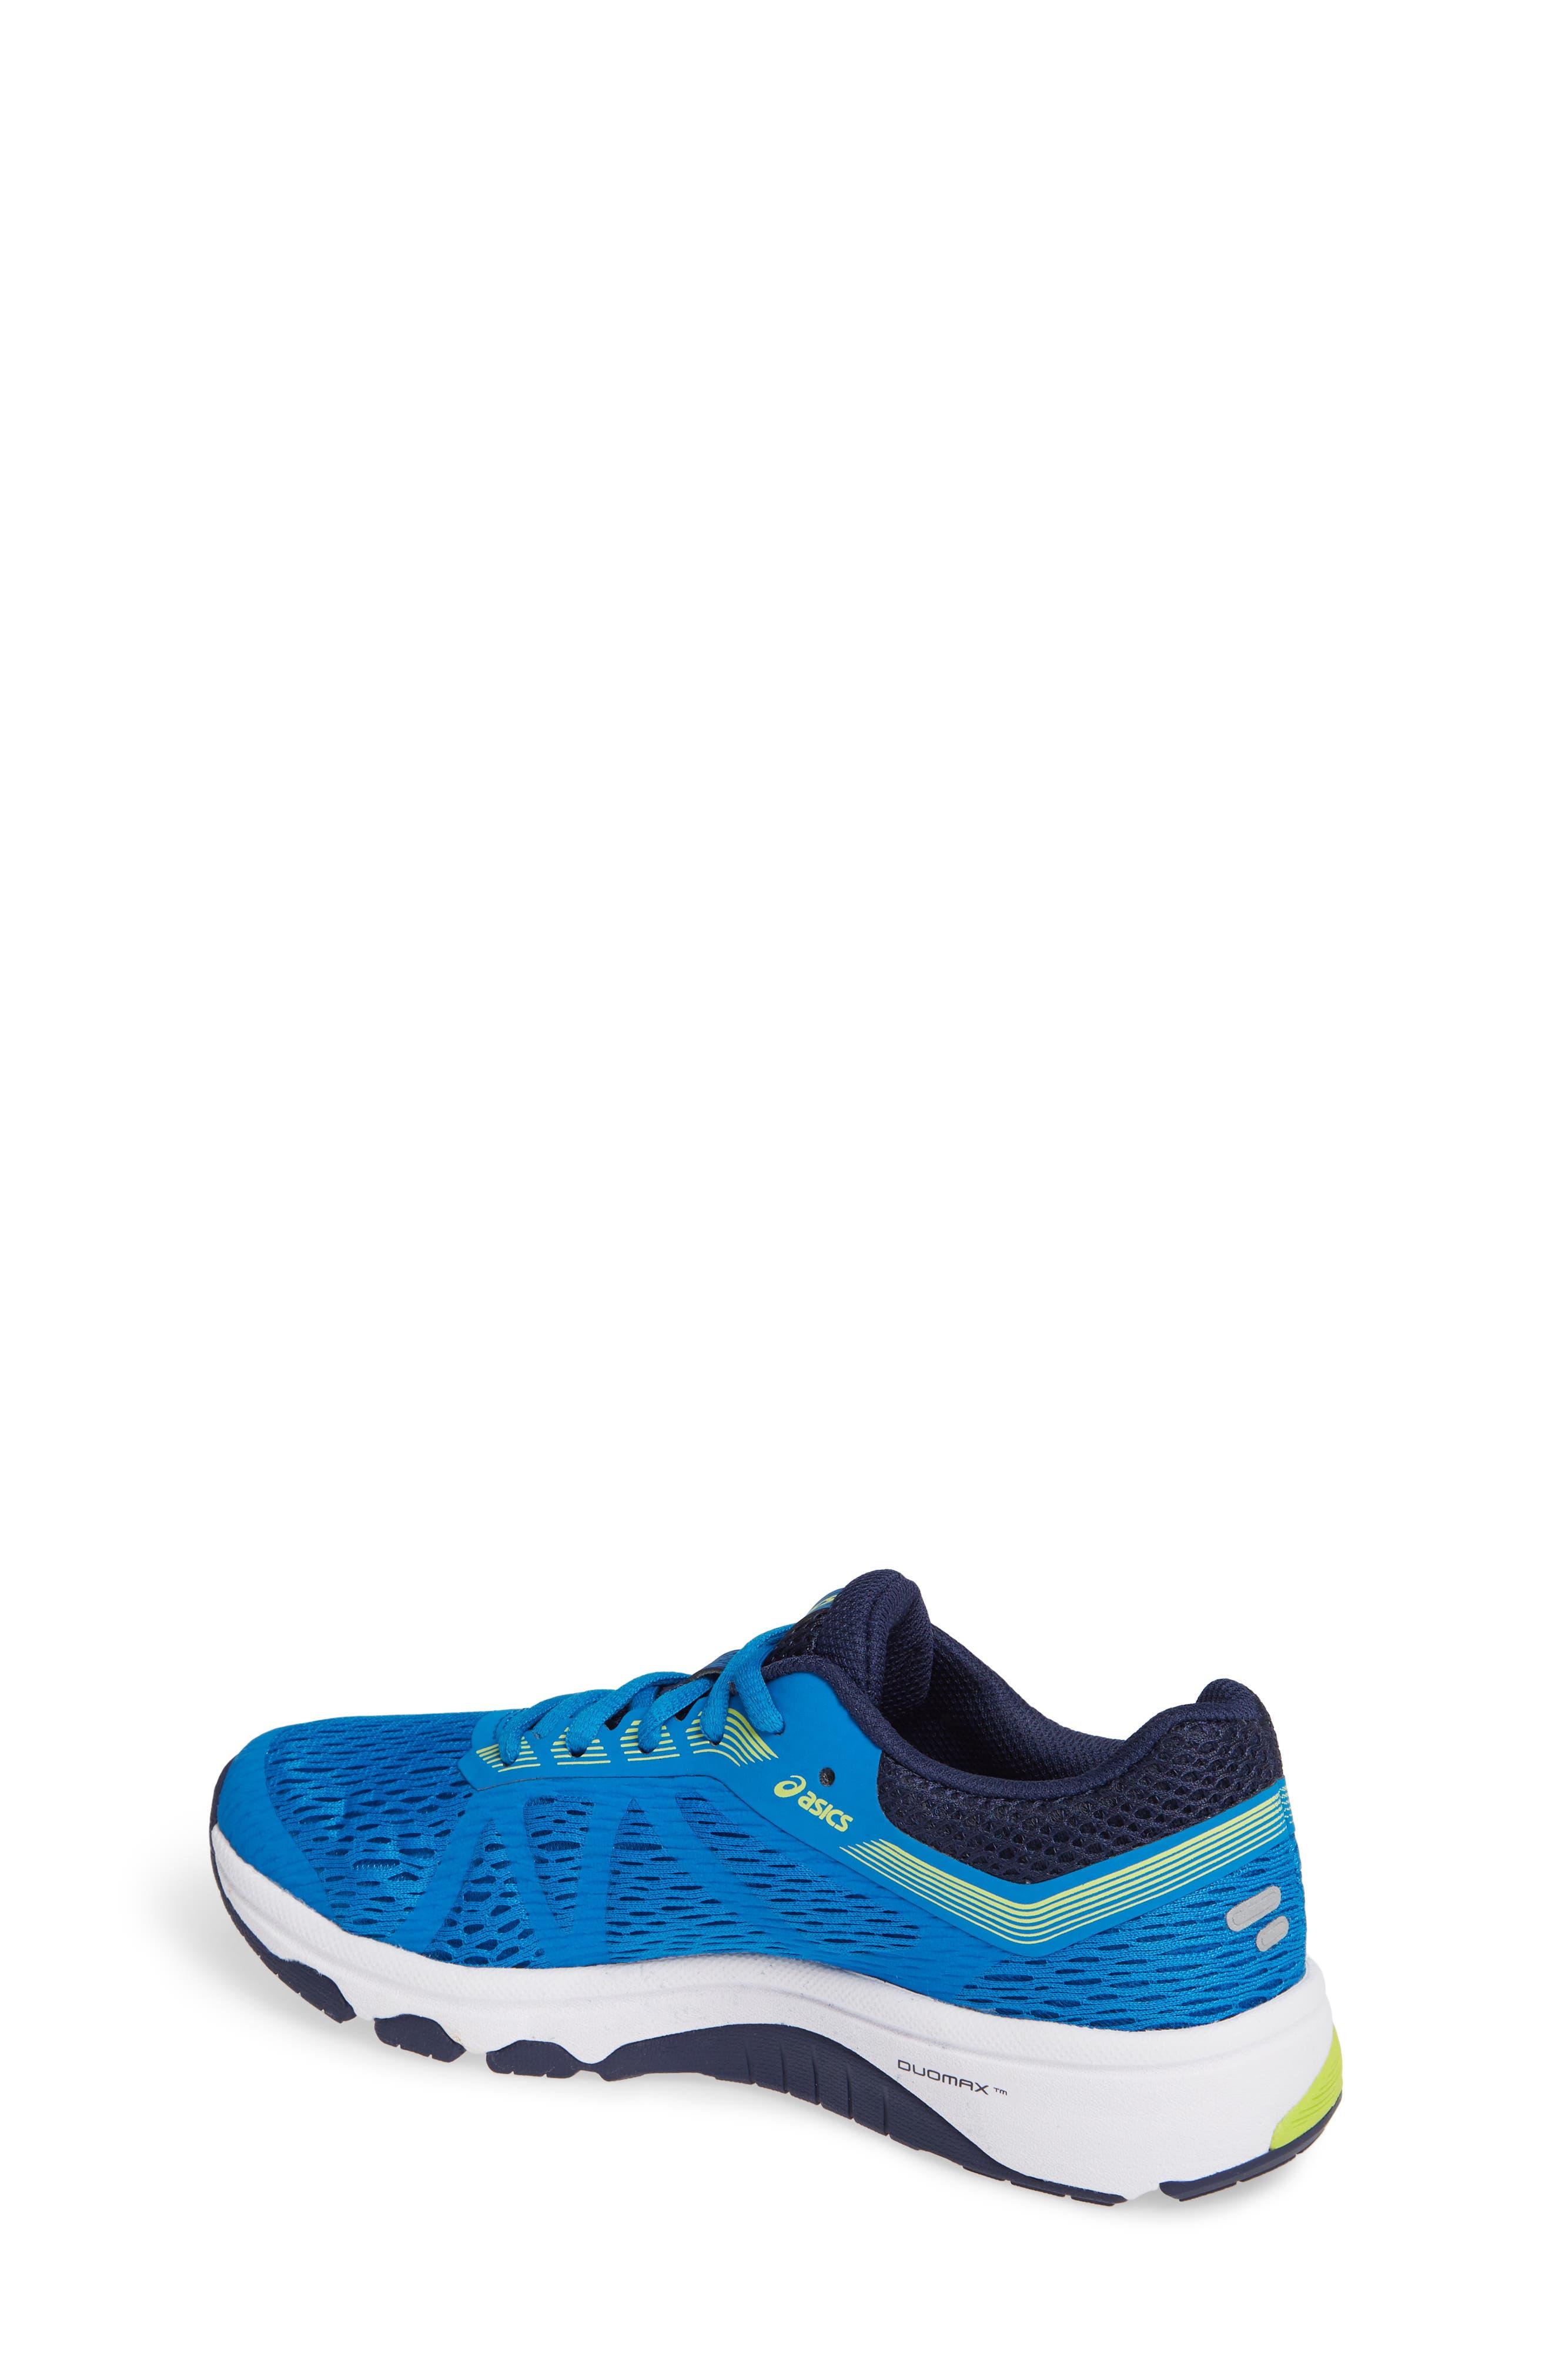 GT 1000 7 Running Shoe,                             Alternate thumbnail 2, color,                             RACE BLUE/ NEON LIME